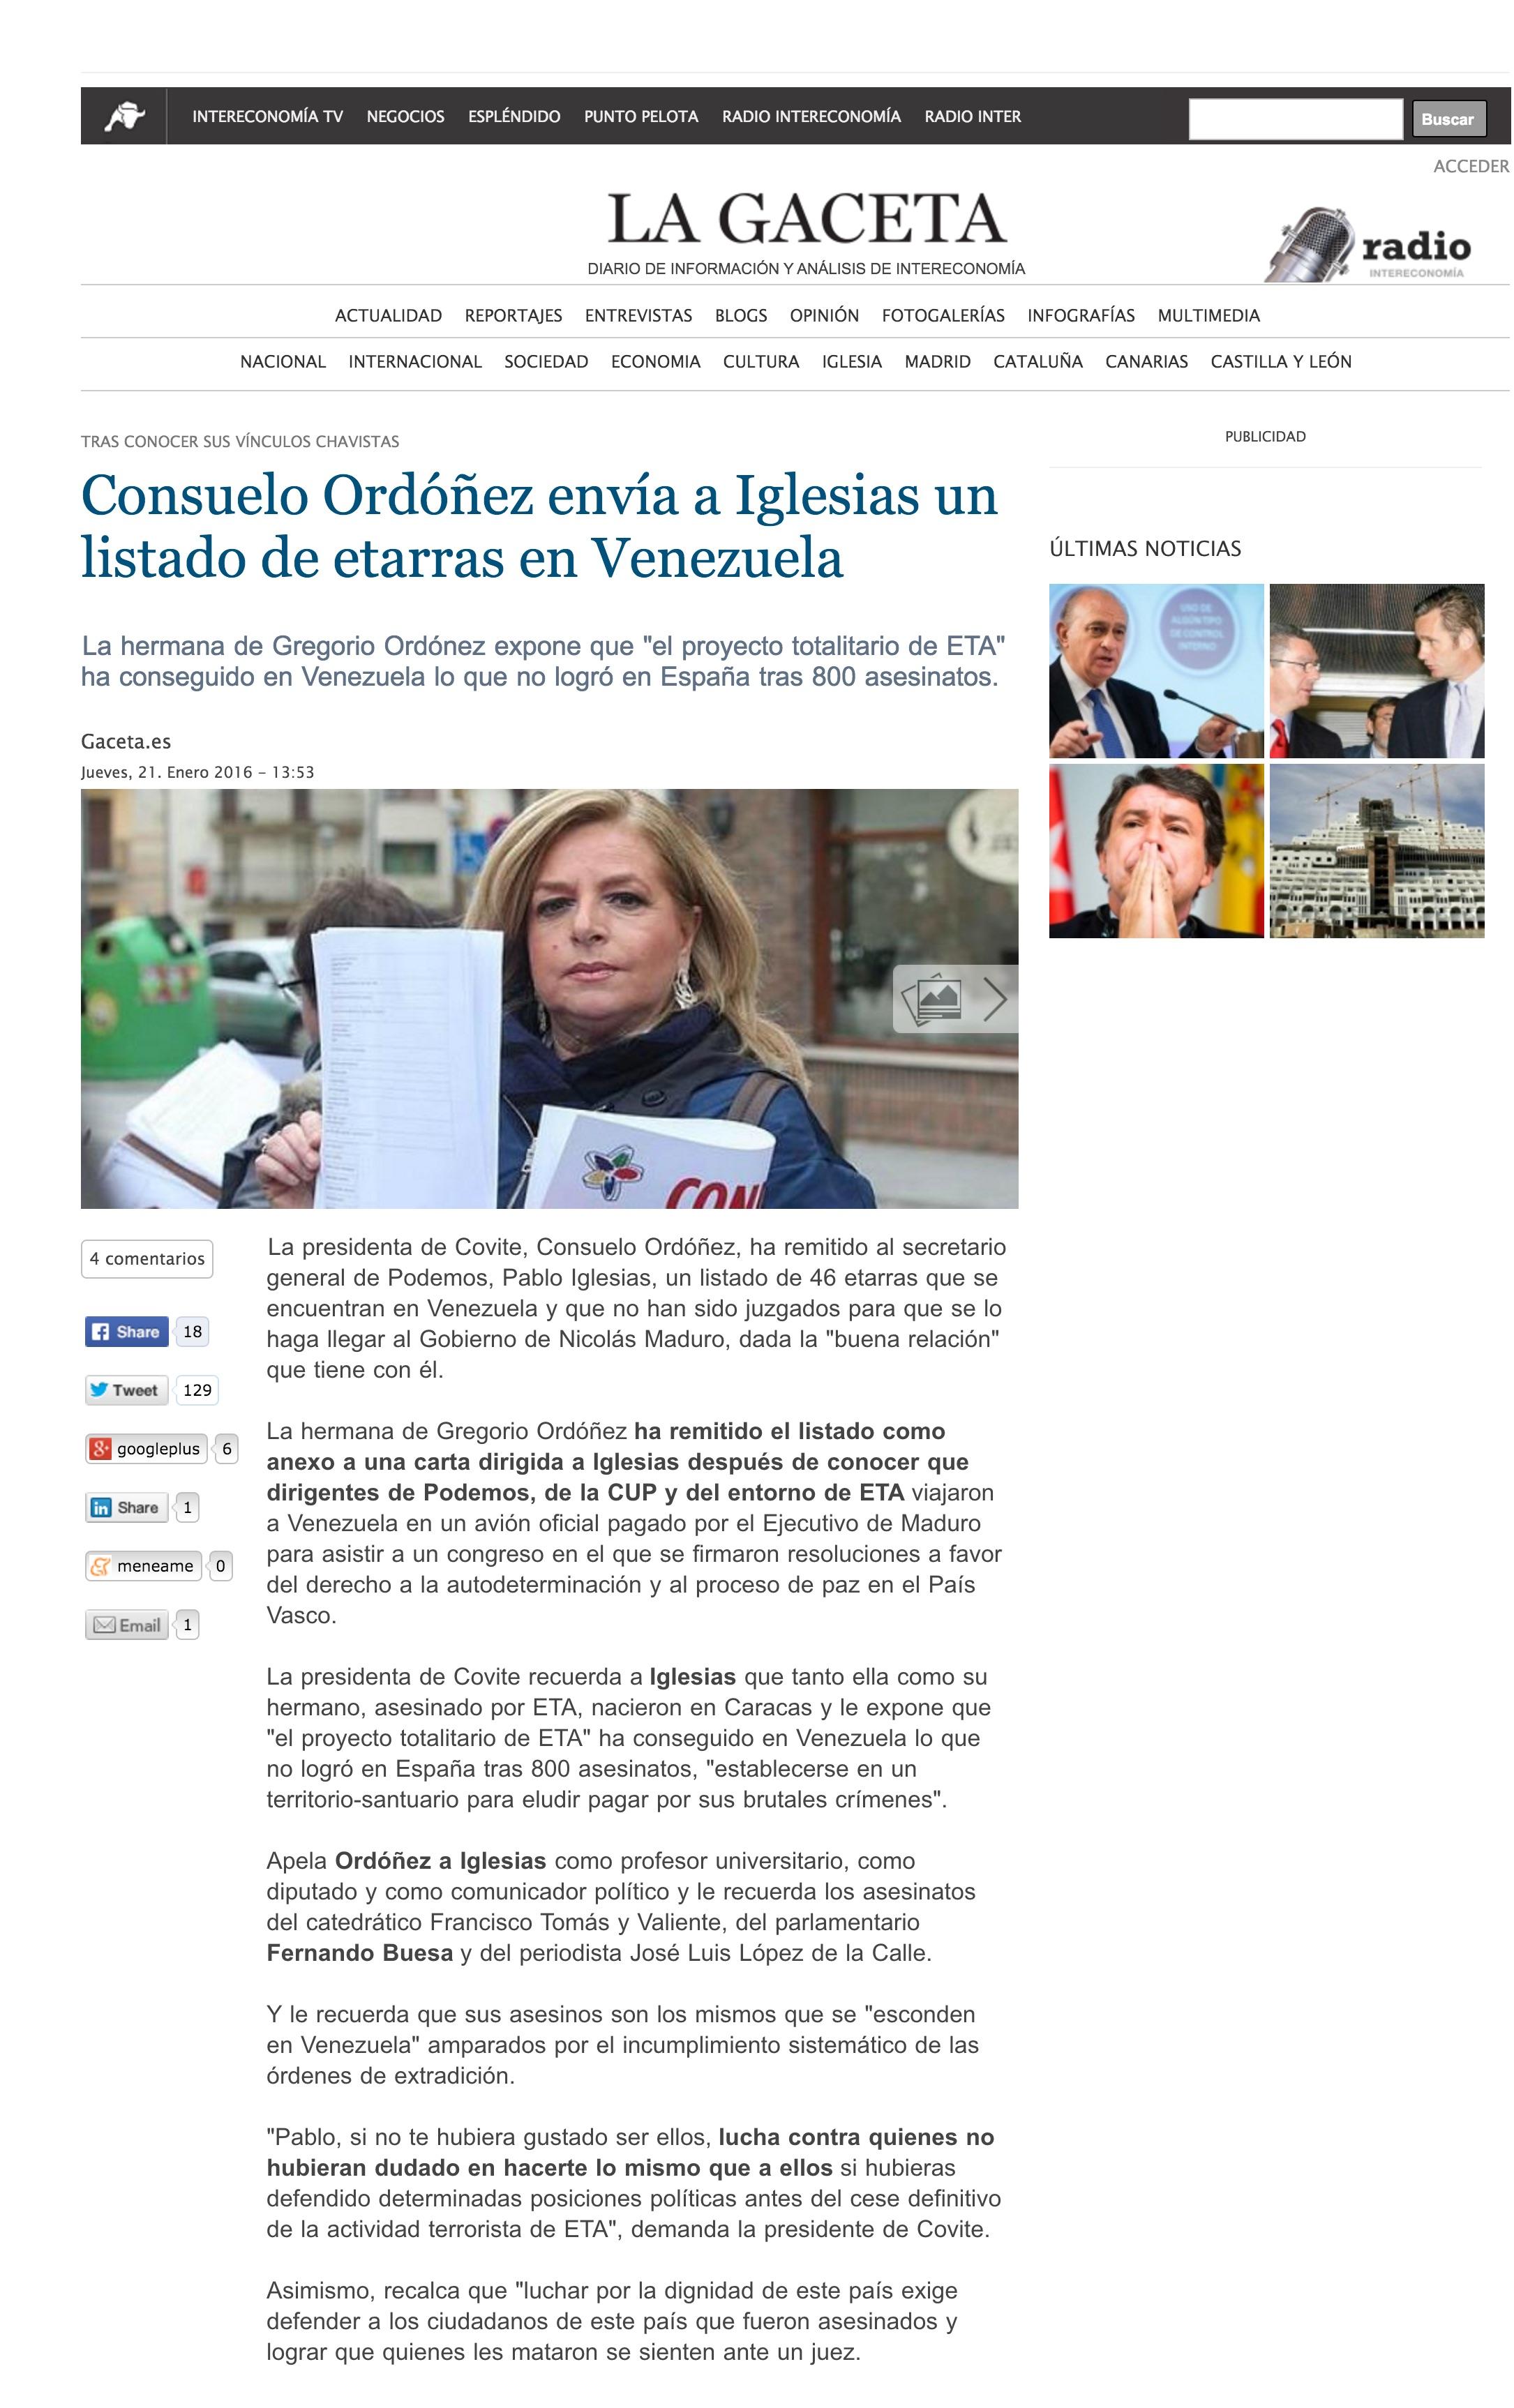 carta_lagaceta